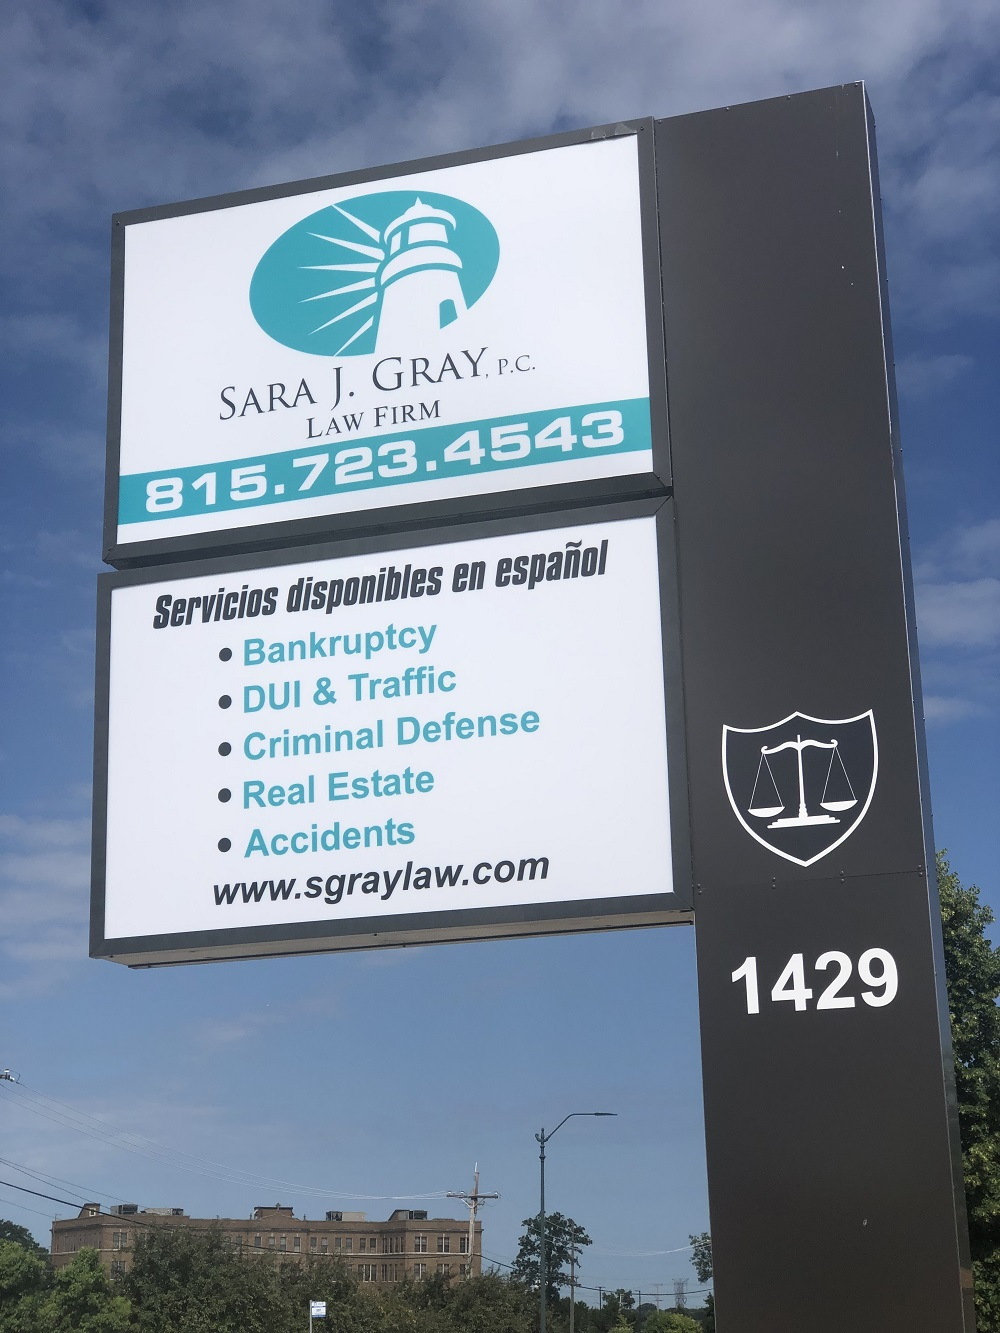 Law Office of Sara J. Gray P.C